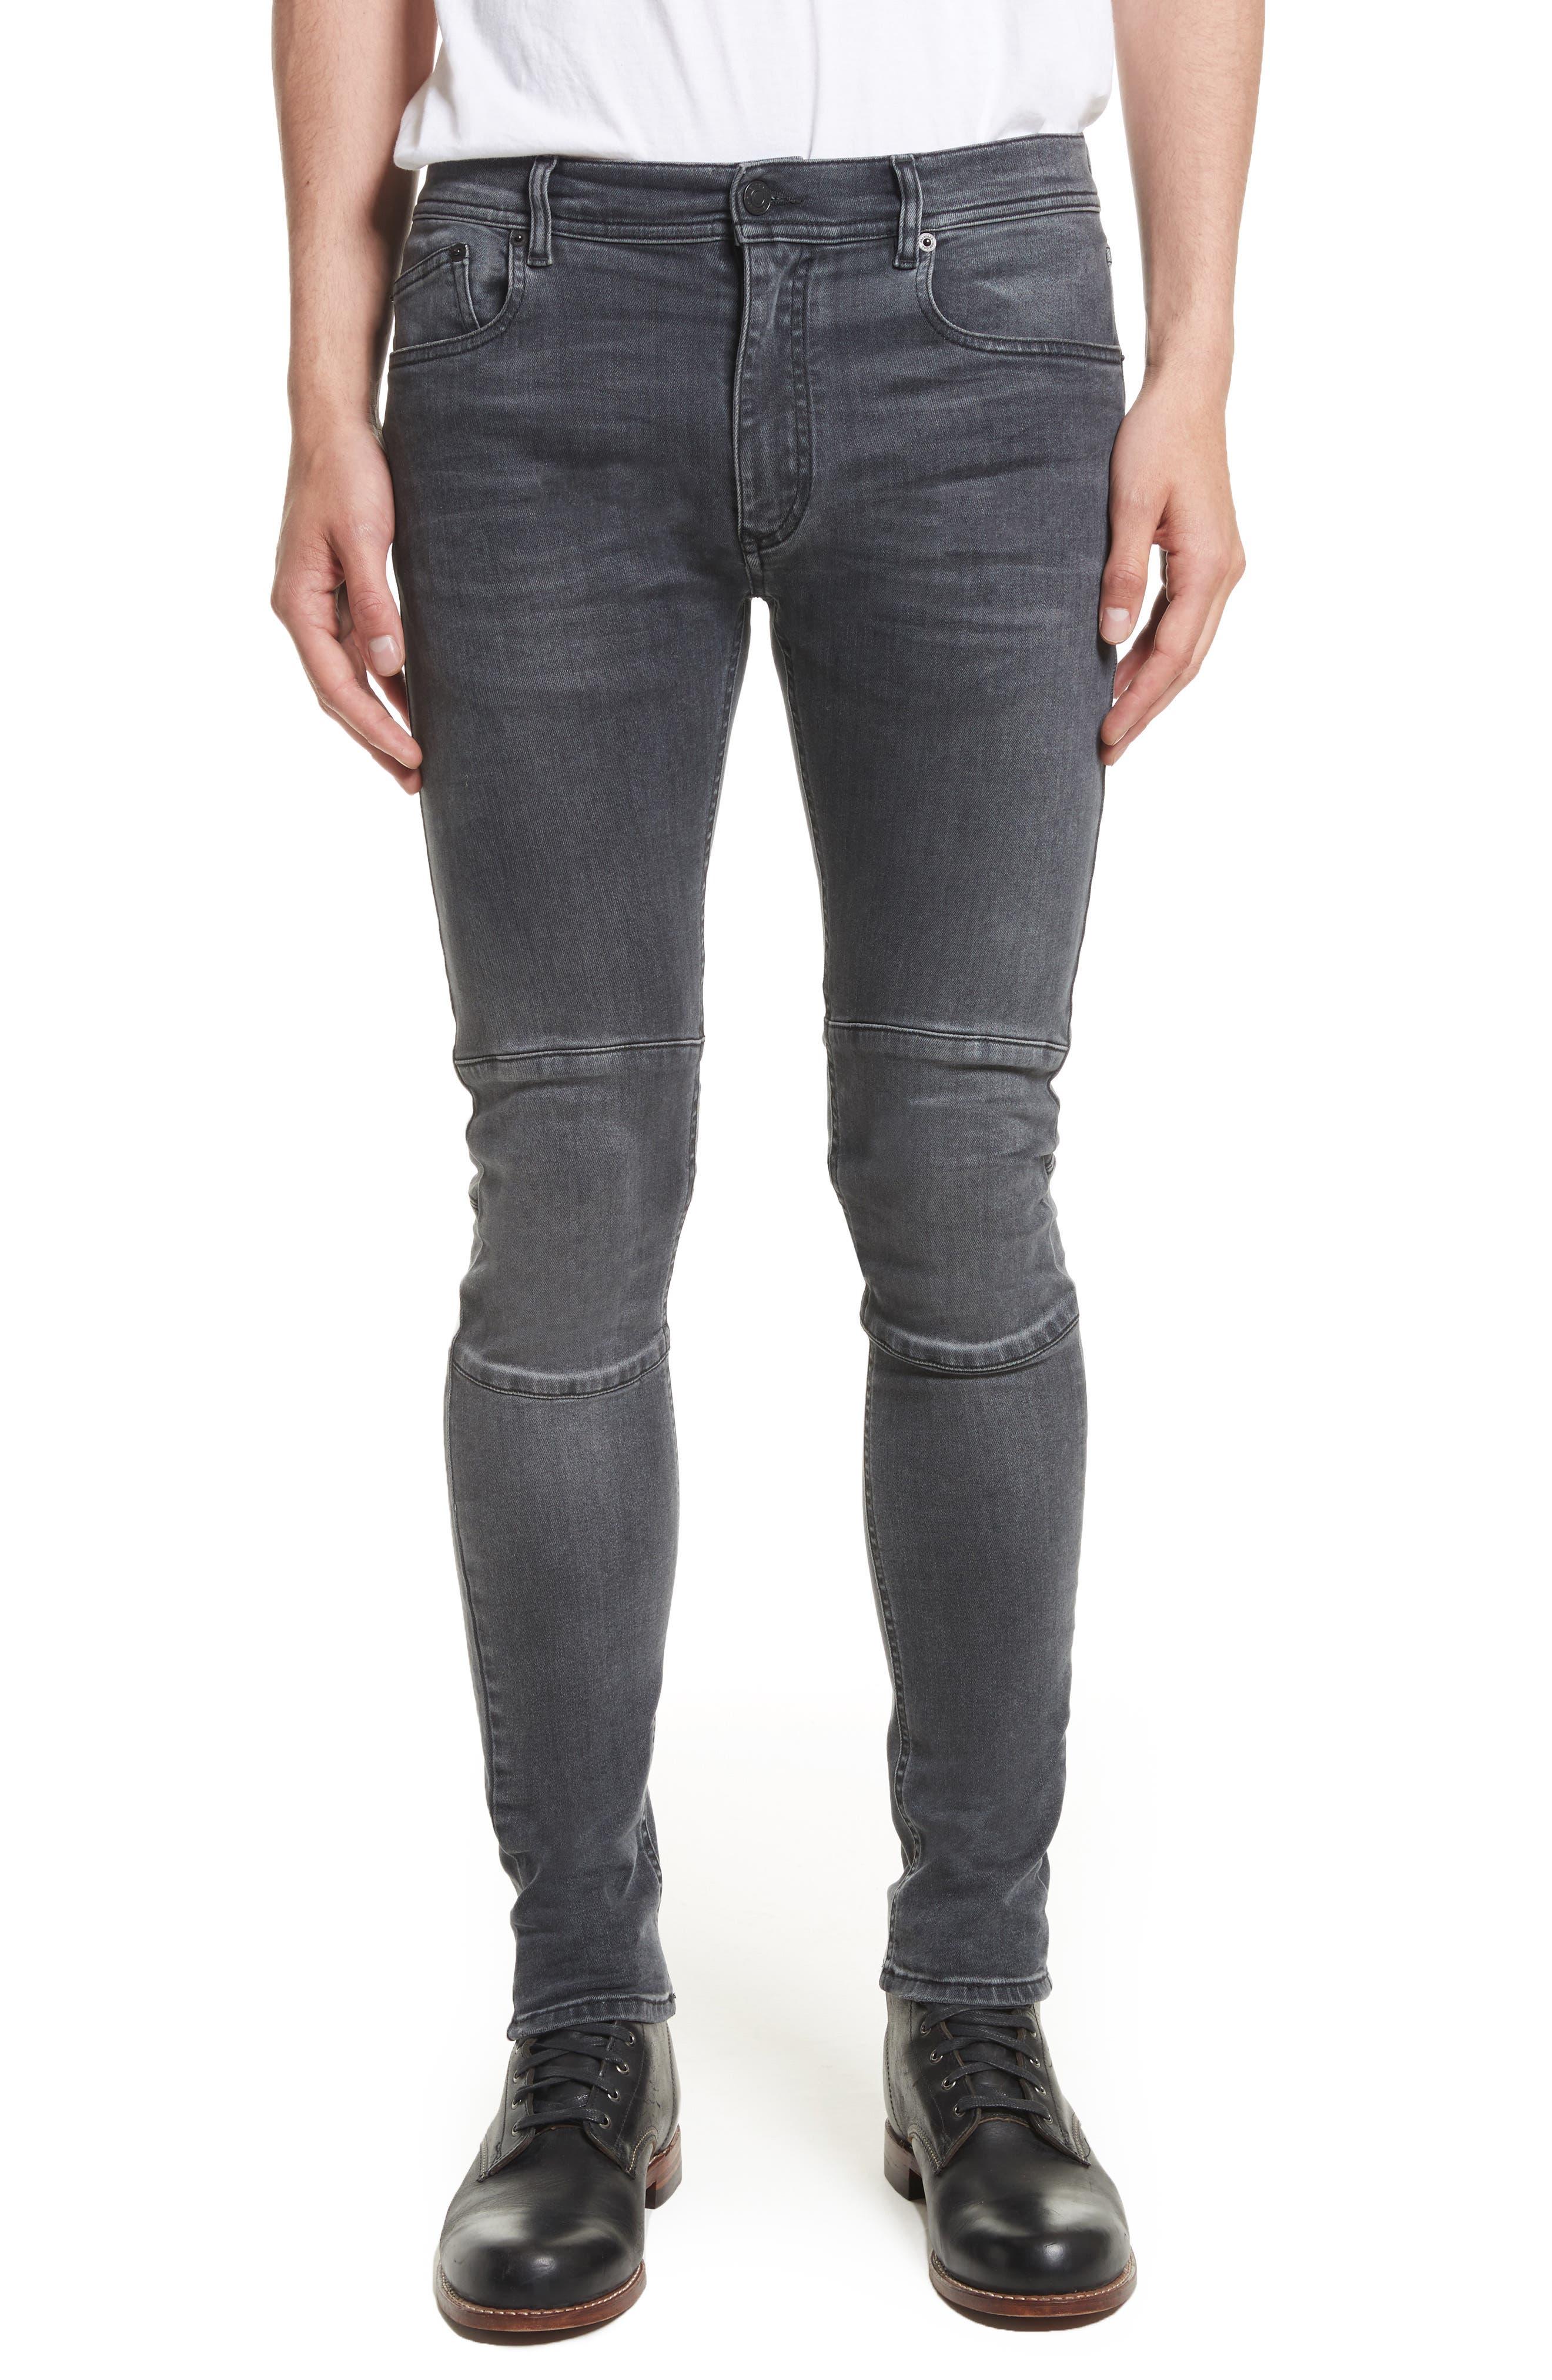 Tattenhall Washed Denim Skinny Jeans,                             Main thumbnail 1, color,                             022